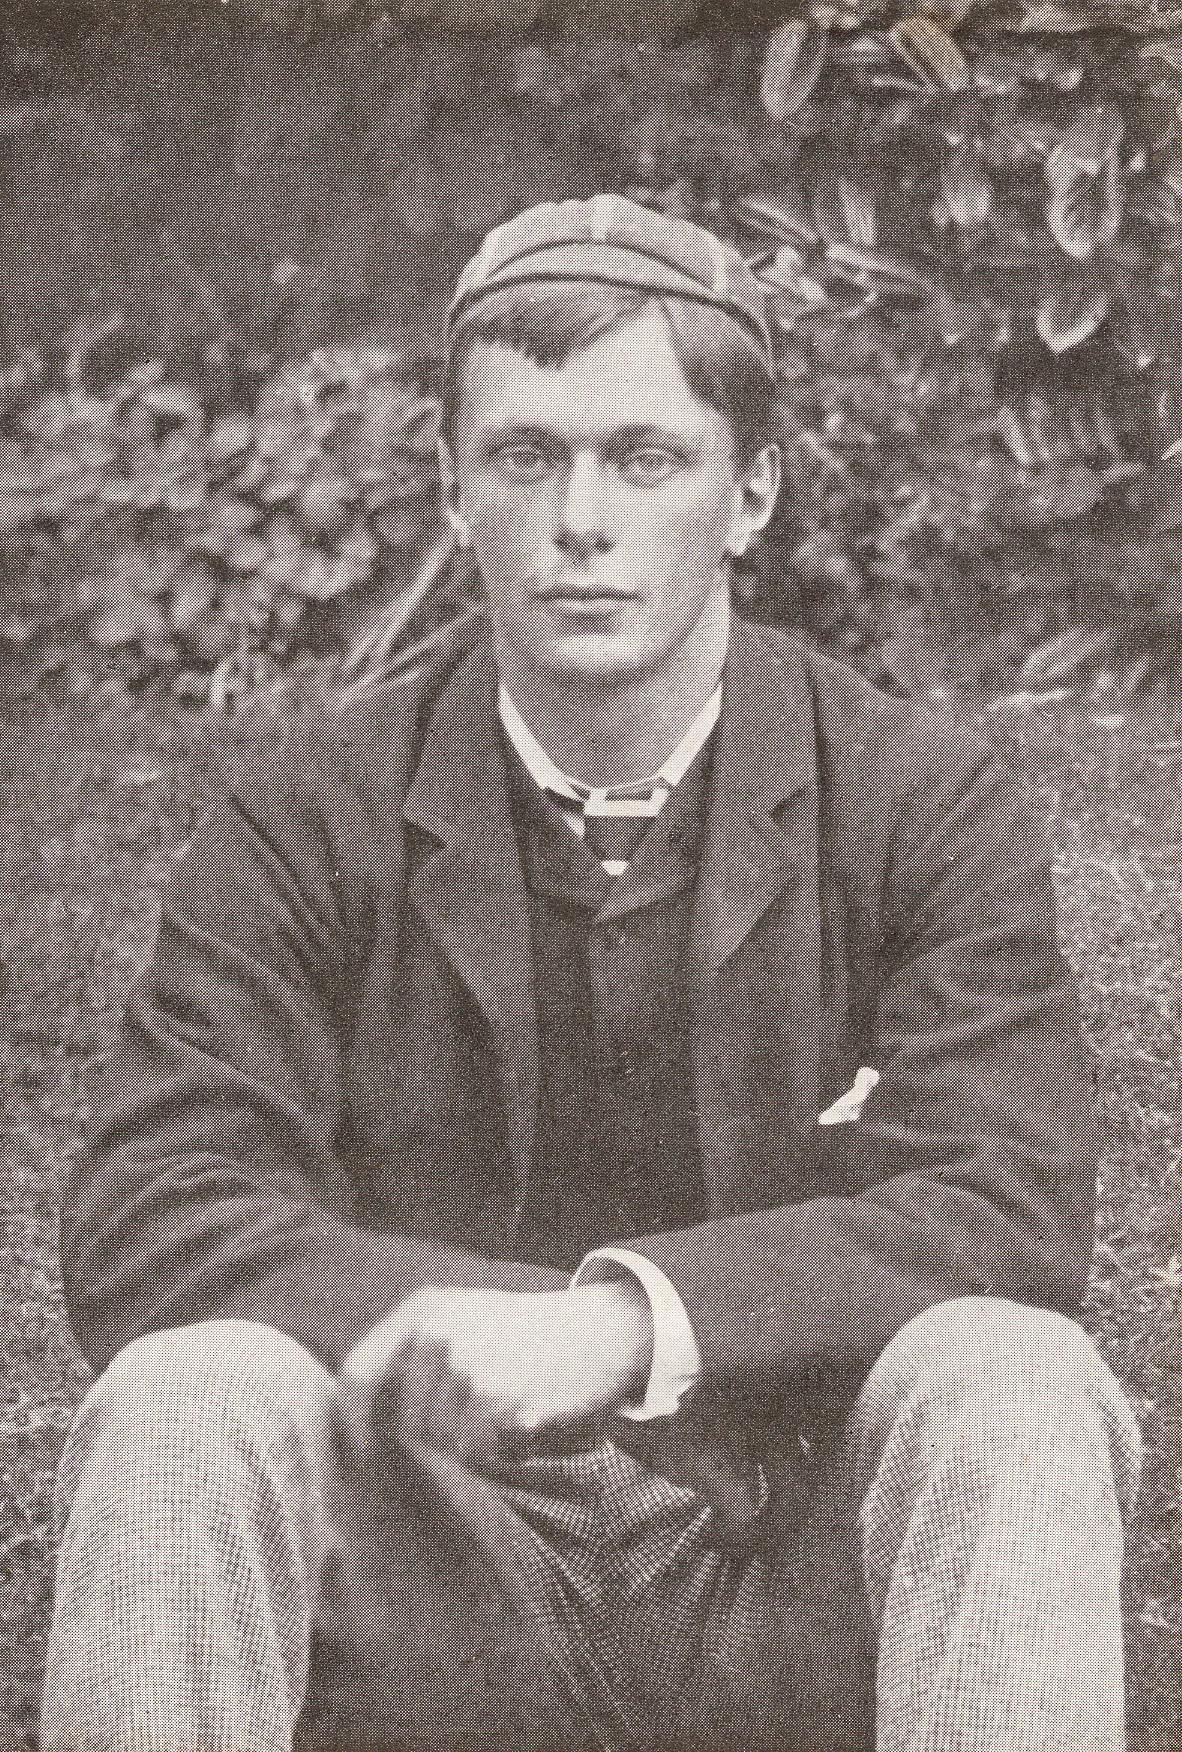 E.F. Benson at 19